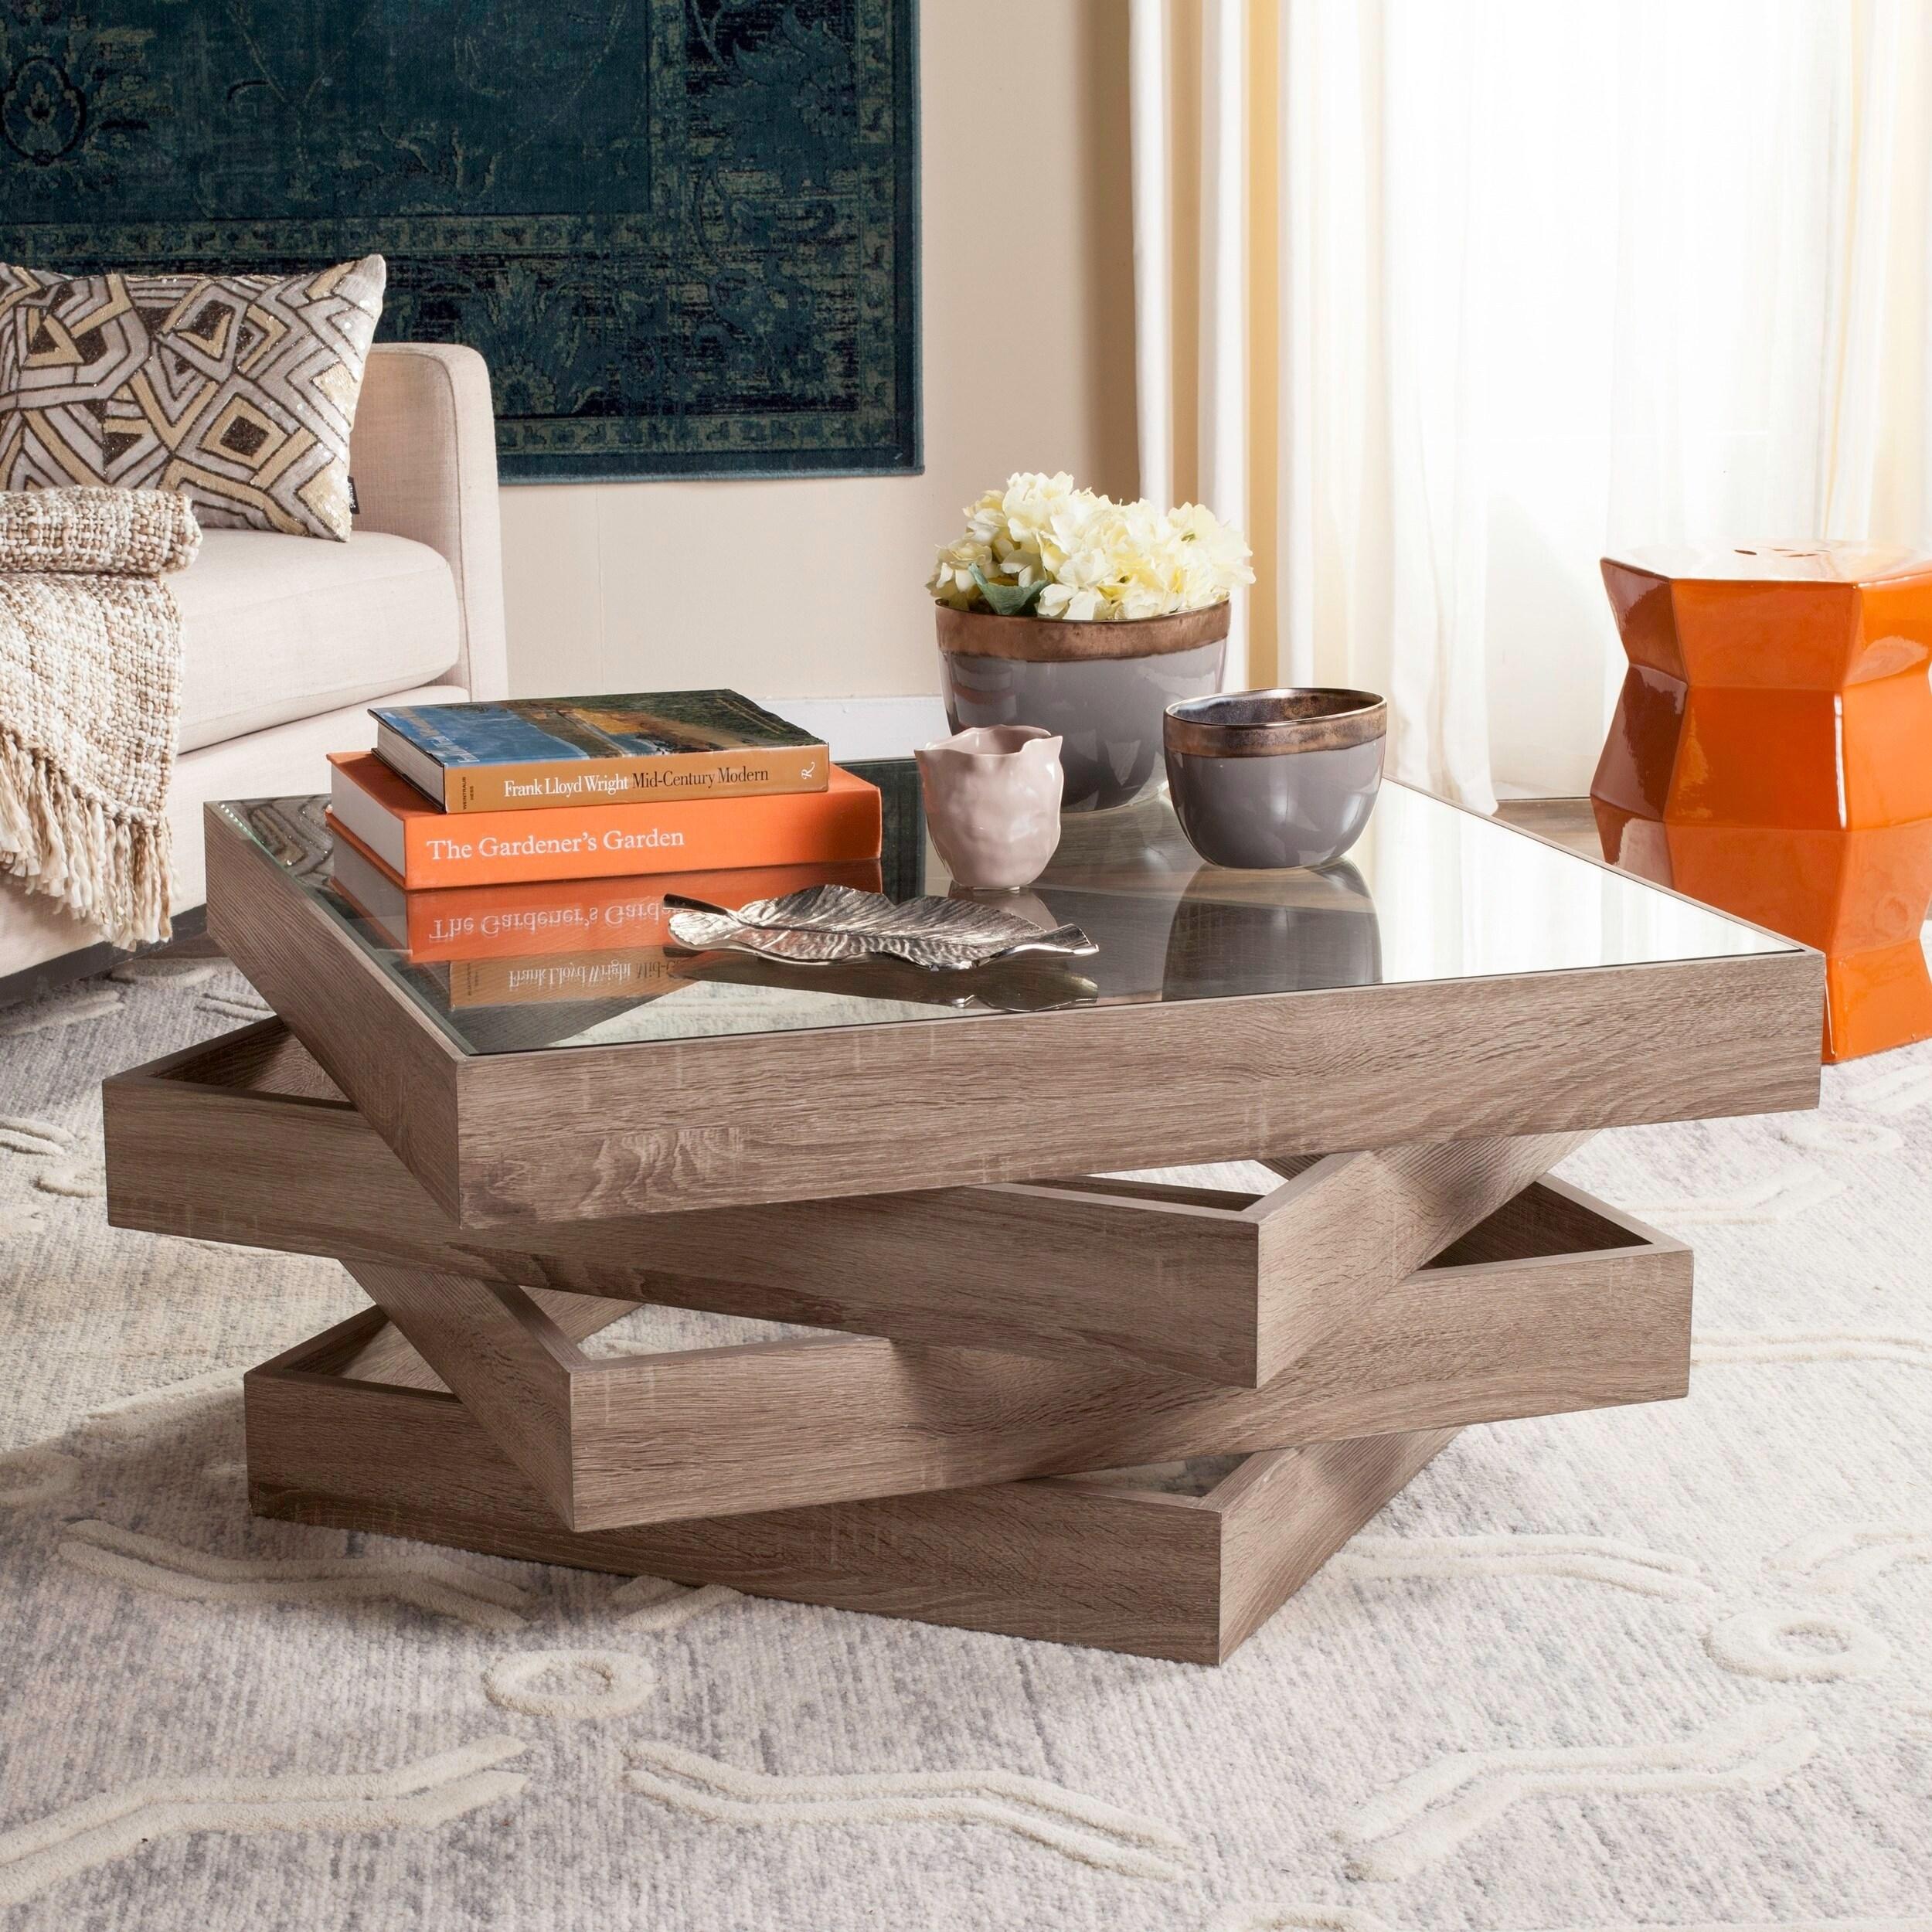 Safavieh Anwen Geometric Wood Coffee Table 33 5 X 15 8